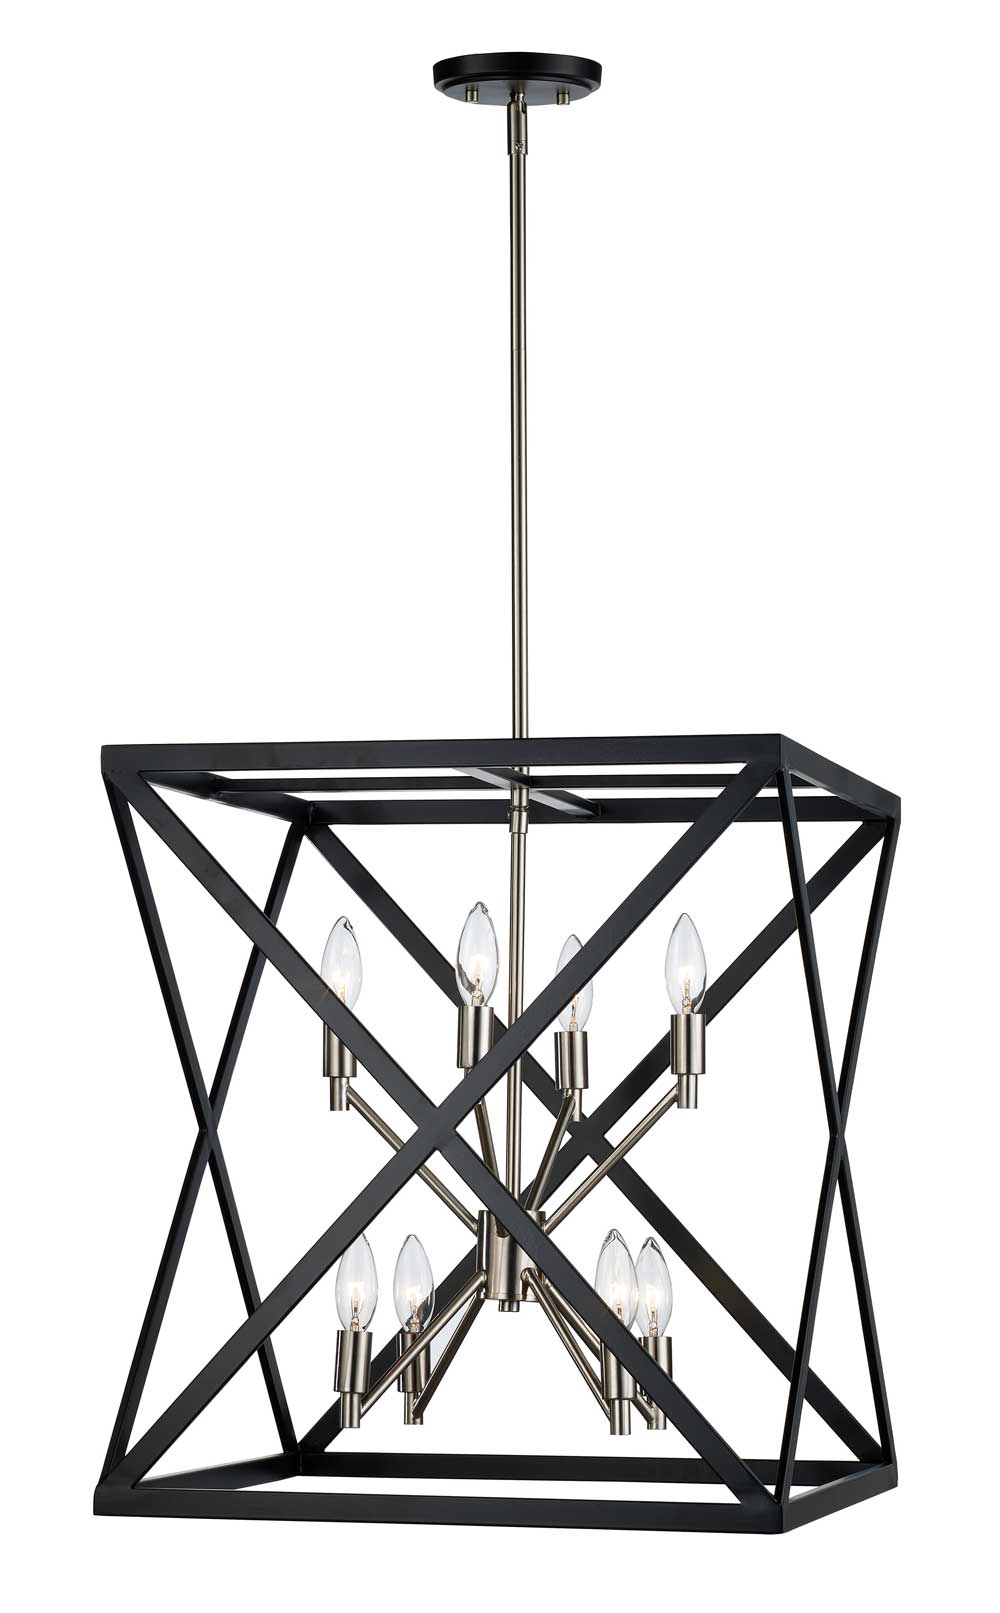 Trans Globe Lighting Awry Steel Collection-71058 BK + BN